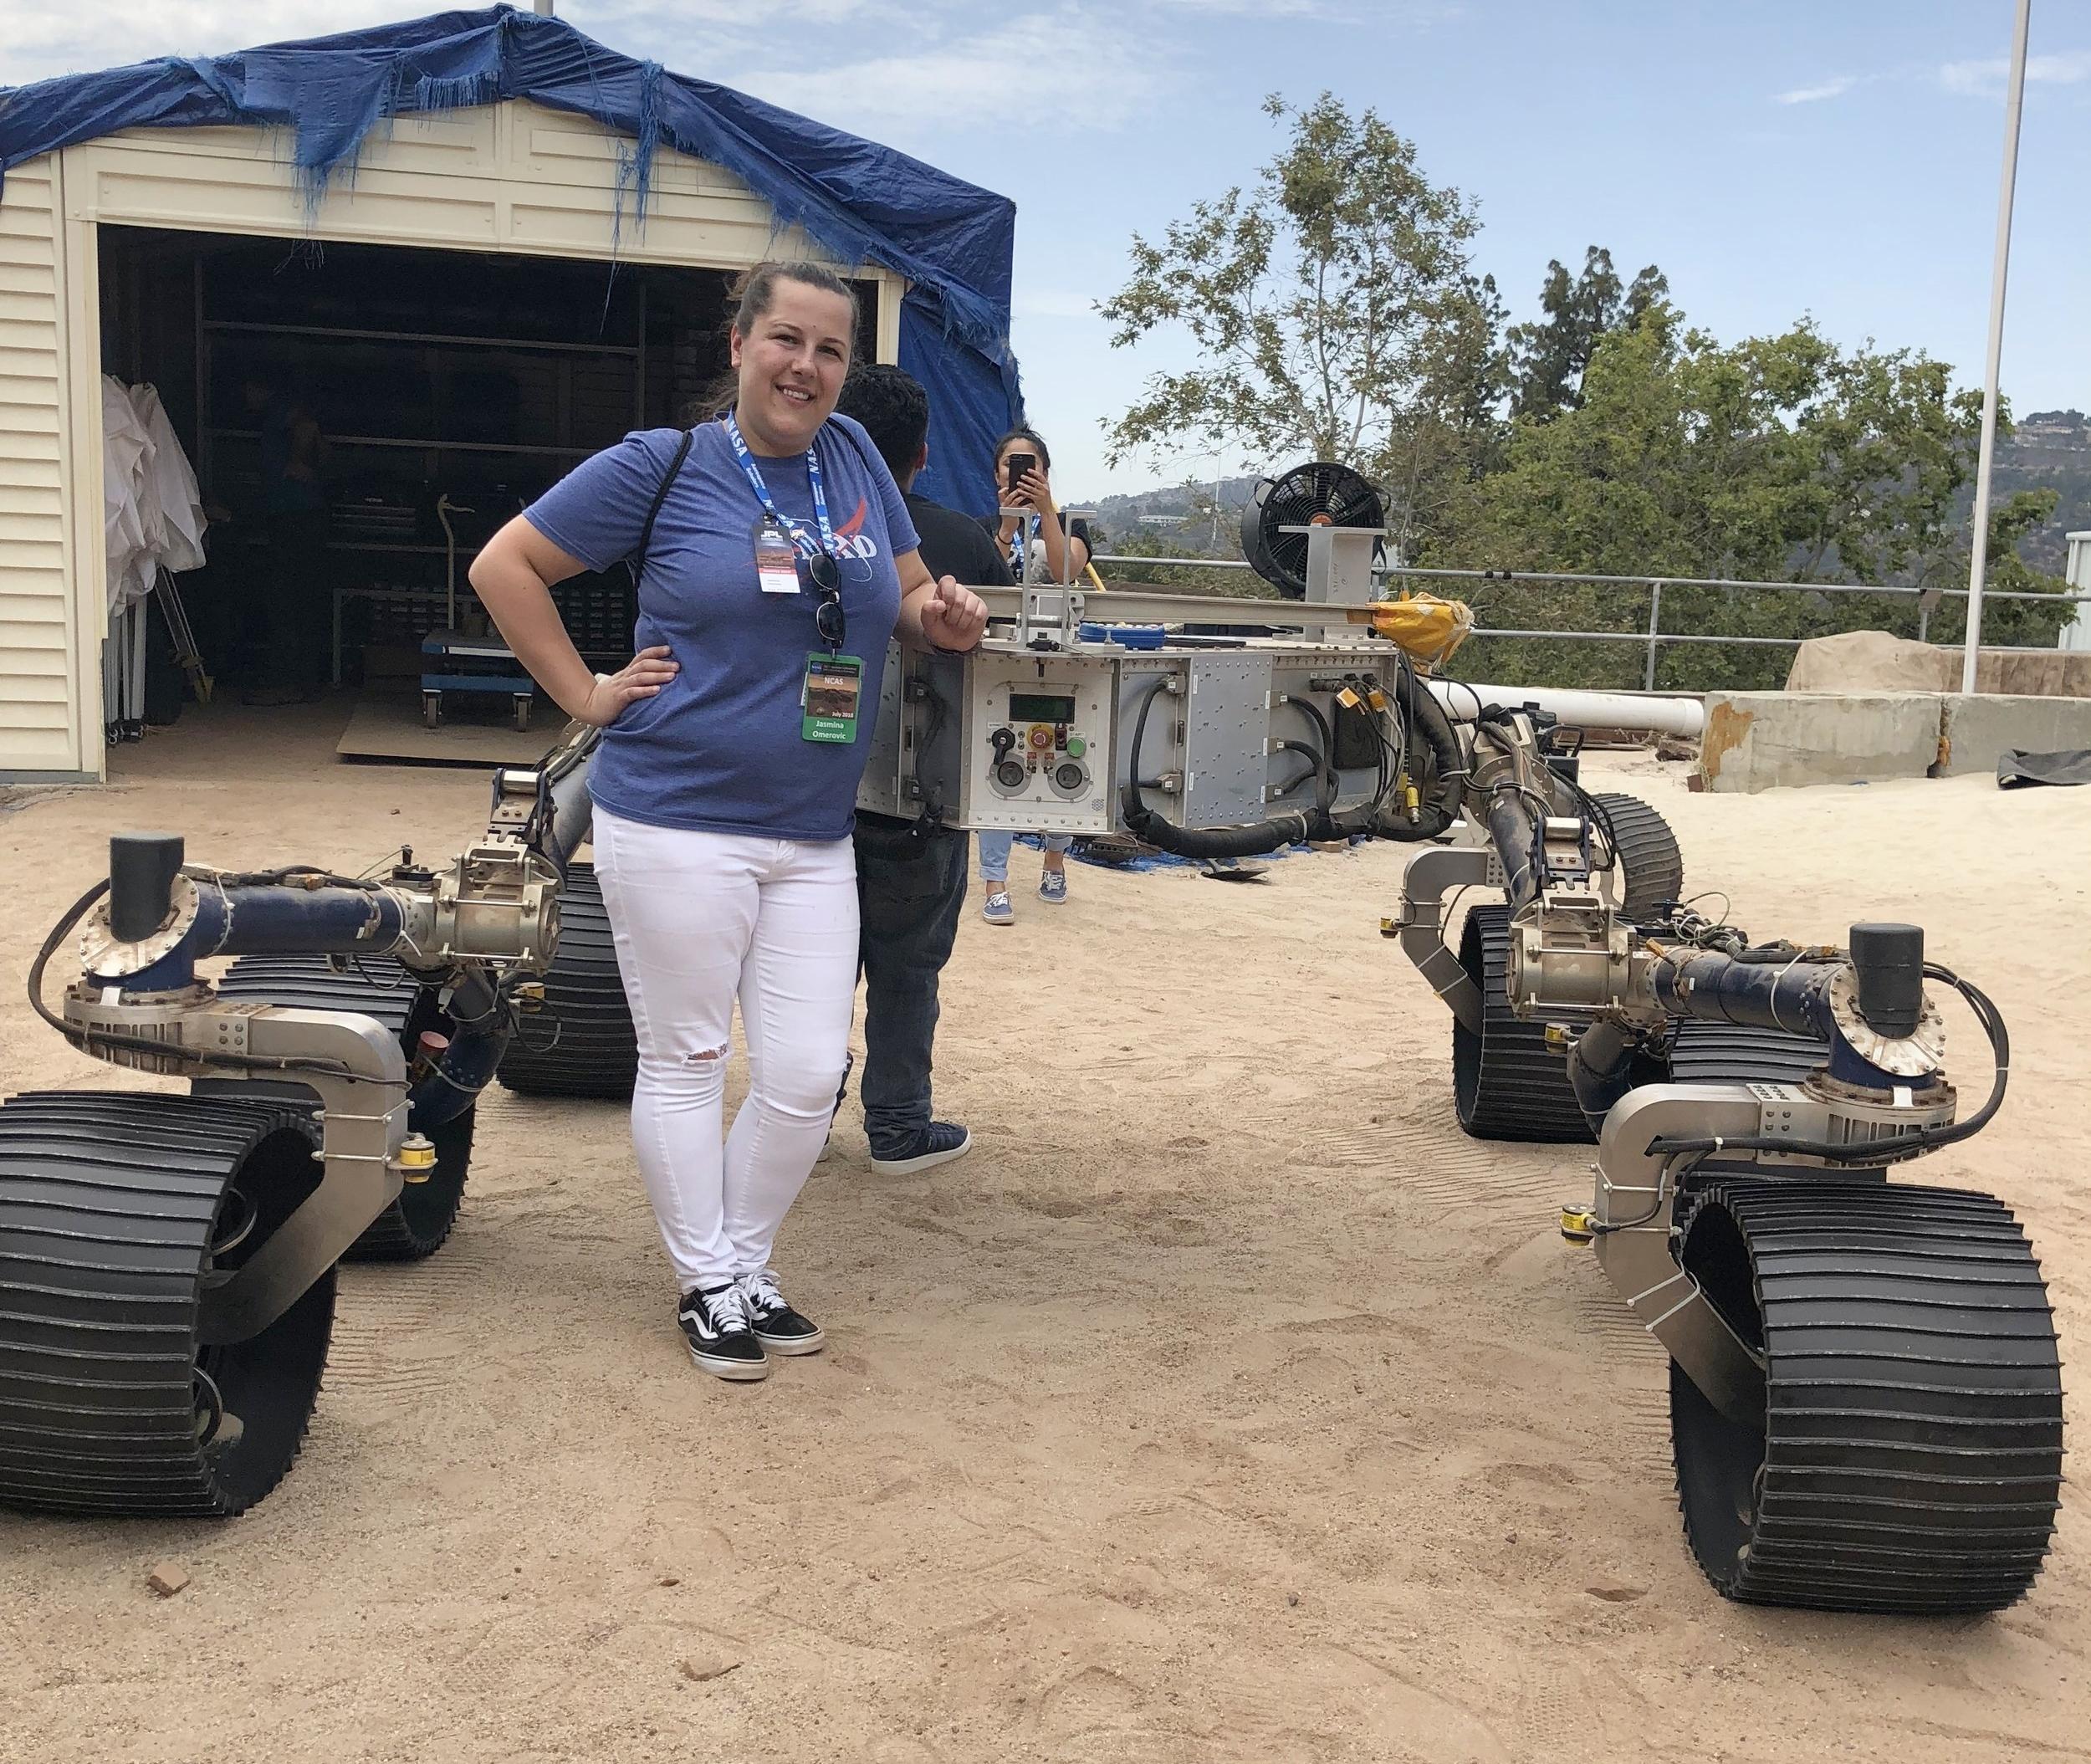 Mina meeting Curiosity in the Mars Yard.